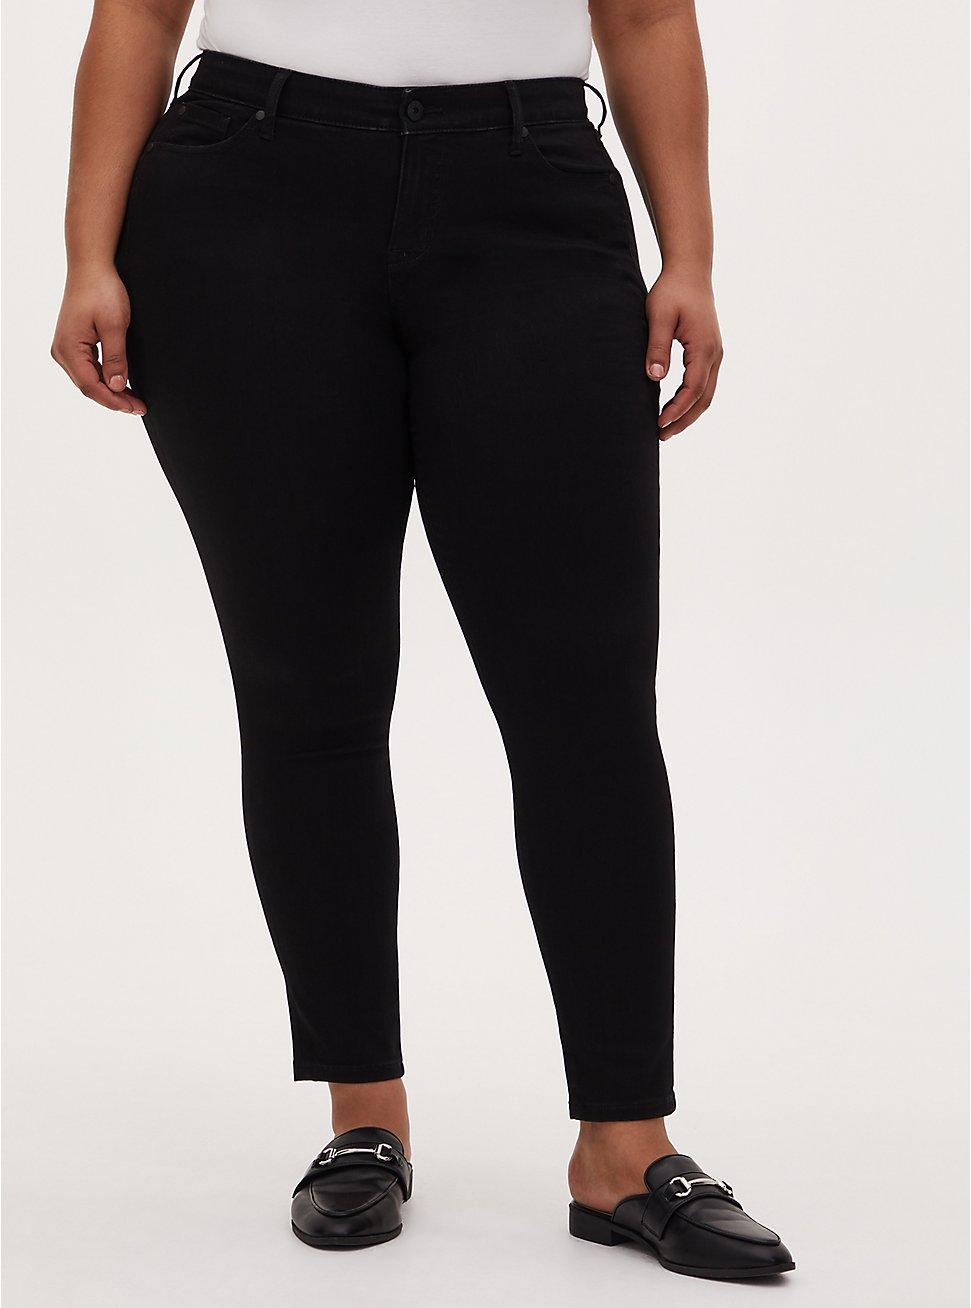 Mid Rise Skinny Jean – Super Soft Black, BLACK, hi-res